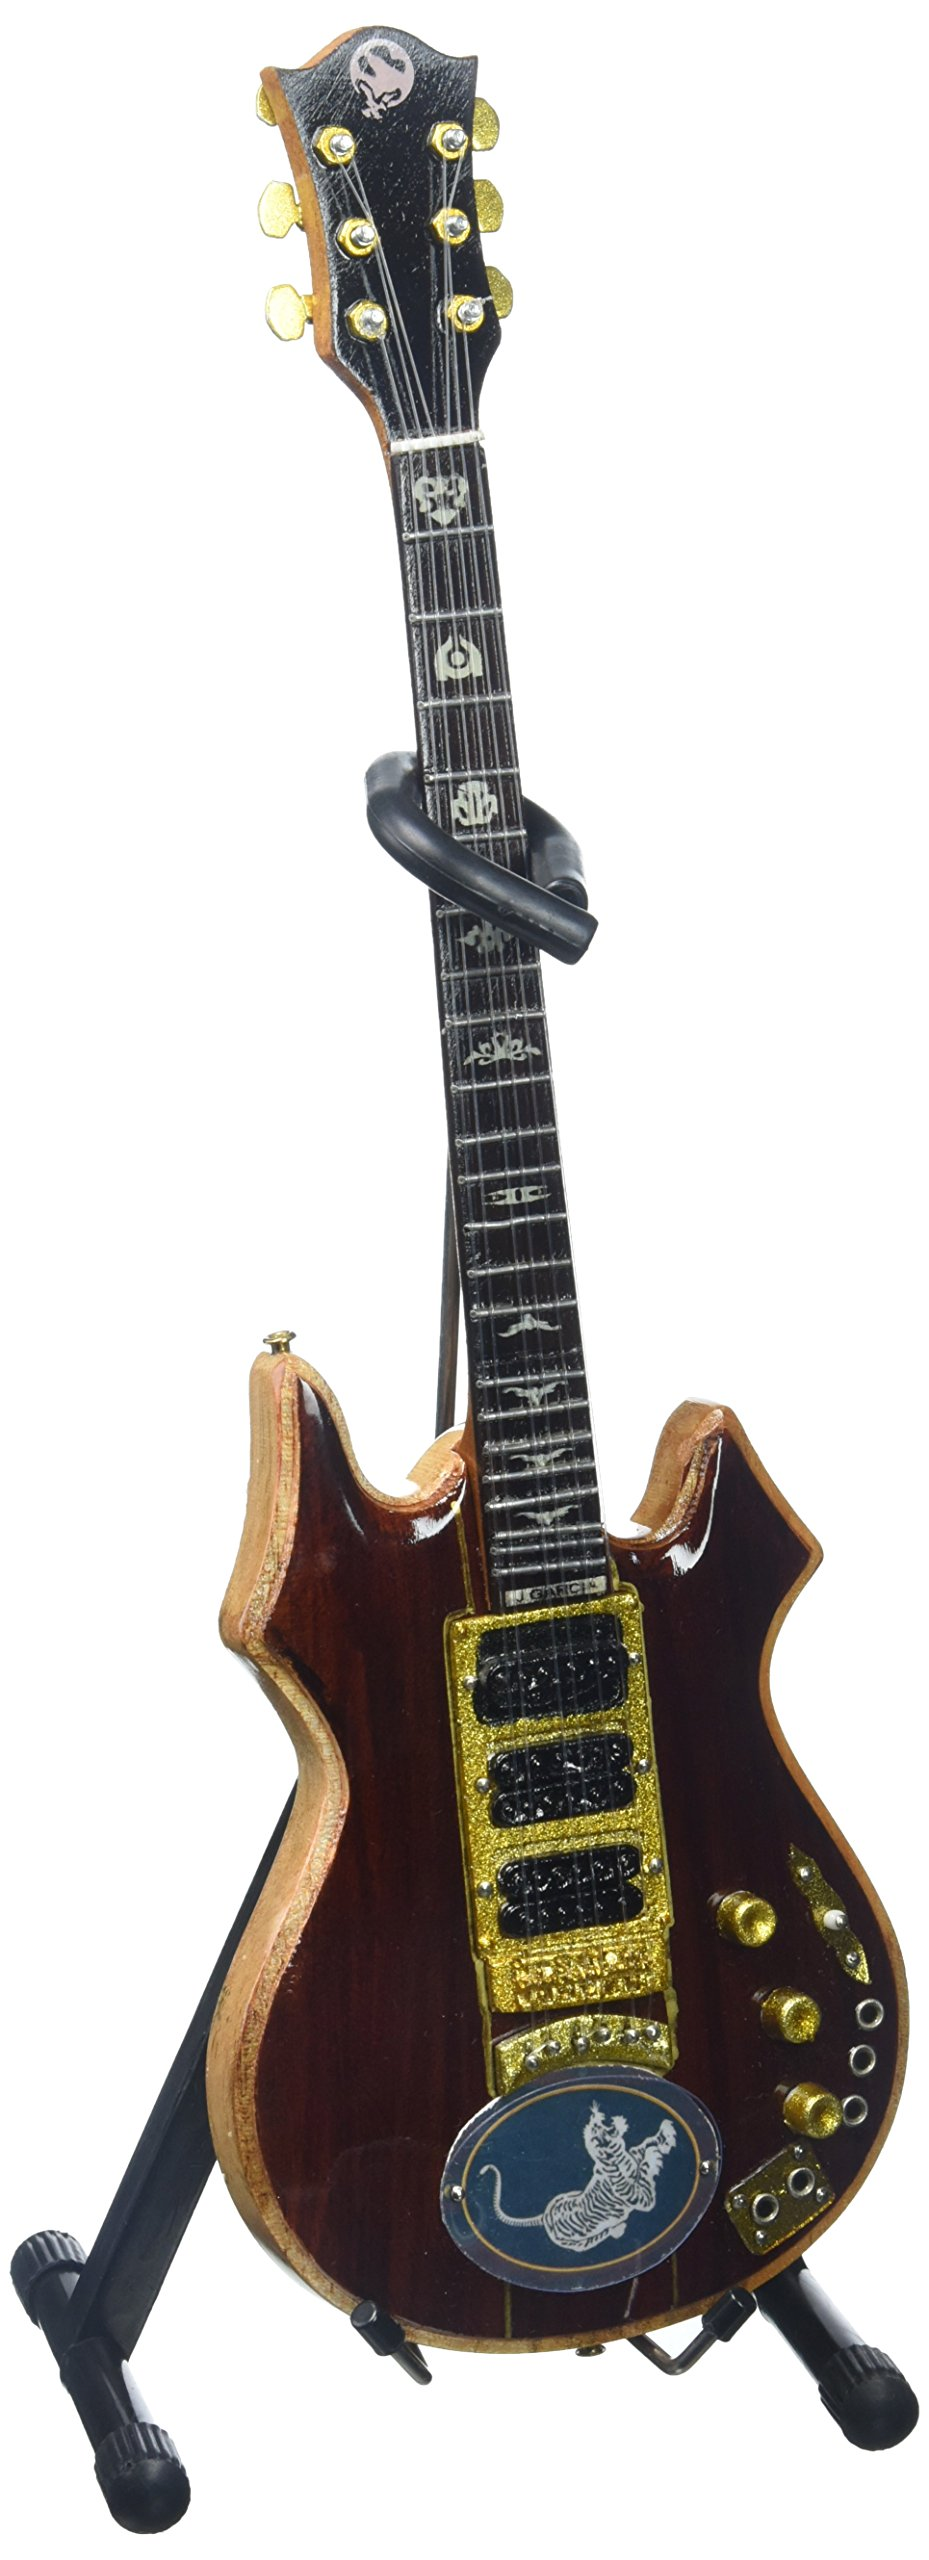 AXE HEAVEN JG-063 Jerry Garcia Signature Tiger Mini Guitar by AXE HEAVEN